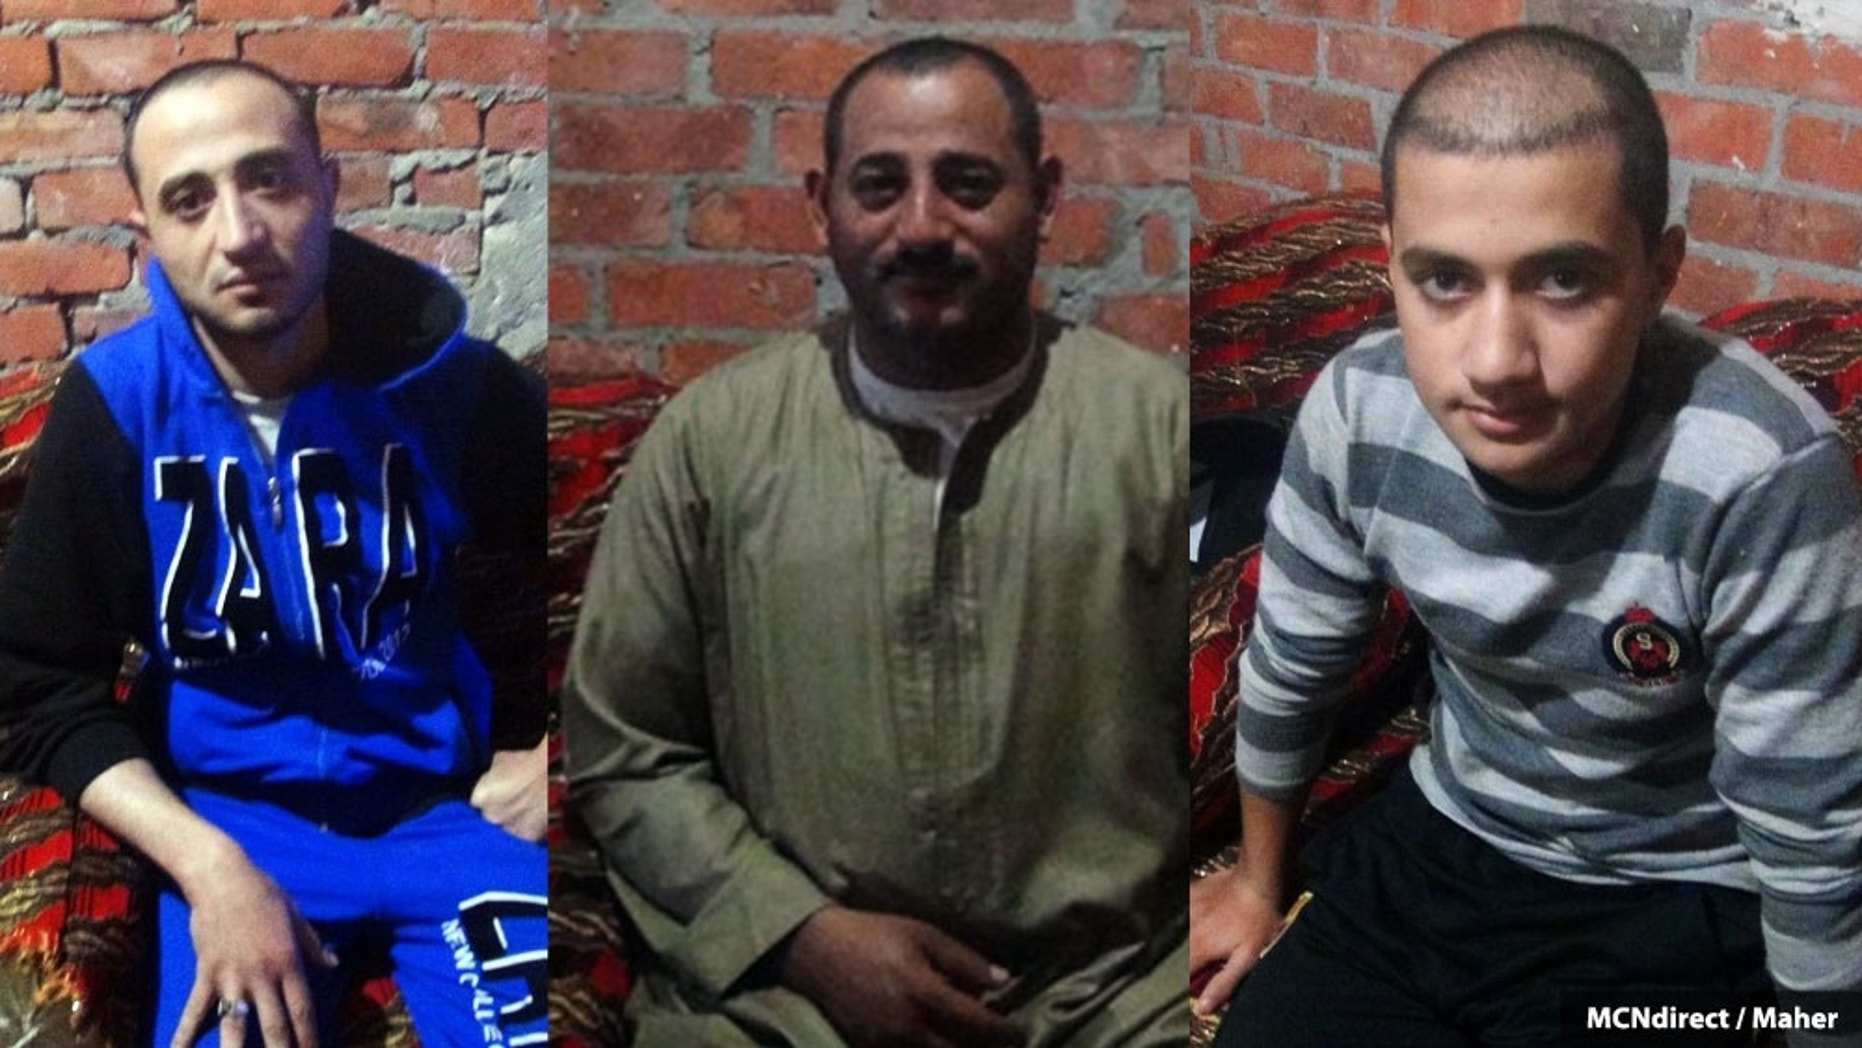 Amgad Makar Zaki, Atef Nadi Habib and Sherif Tawwad Hakim,  told MidEast Christian News they were tortured in Libya. (Courtesy: MCN)